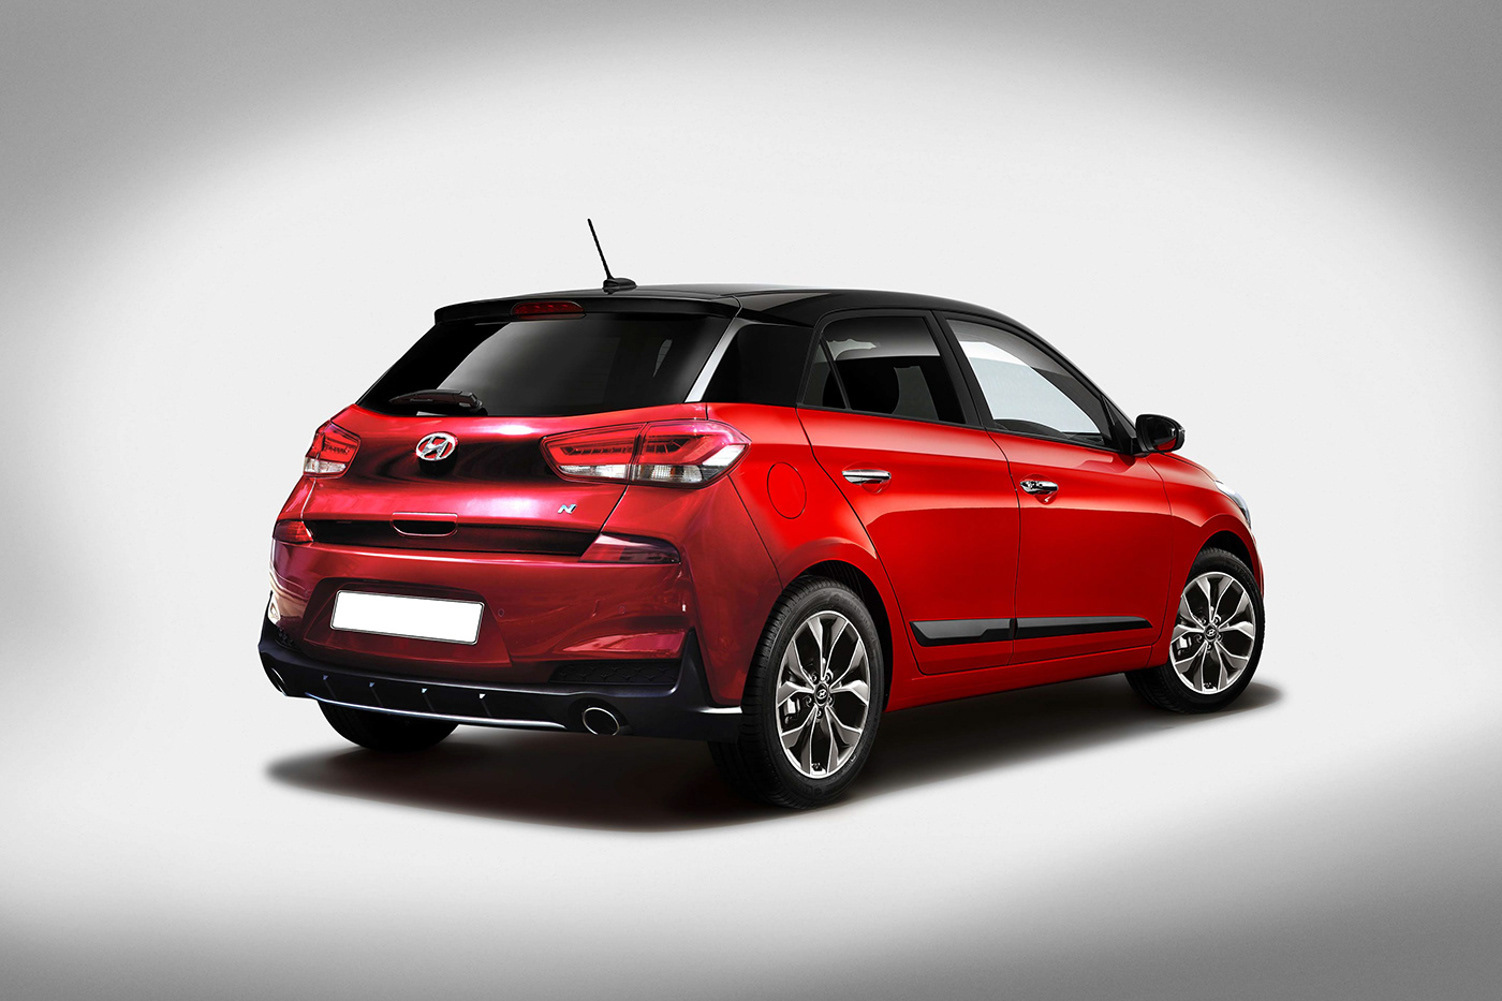 Adelanto del Hyundai i20N la peor pesadilla del VW Polo GTi Hyundai-i20-n-adelanto-2